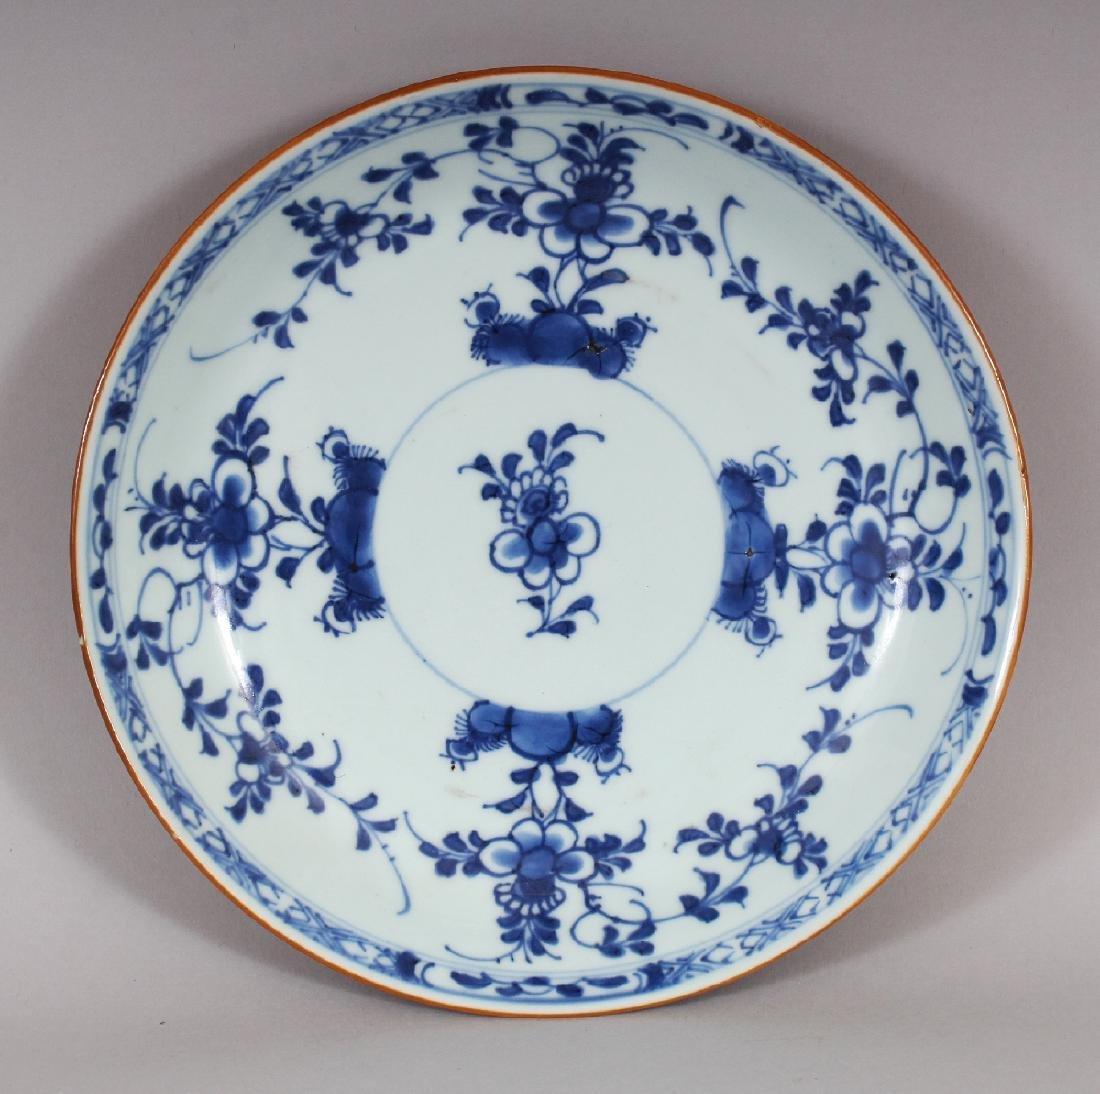 A CHINESE KANGXI PERIOD BLUE & WHITE BATAVIAN WARE